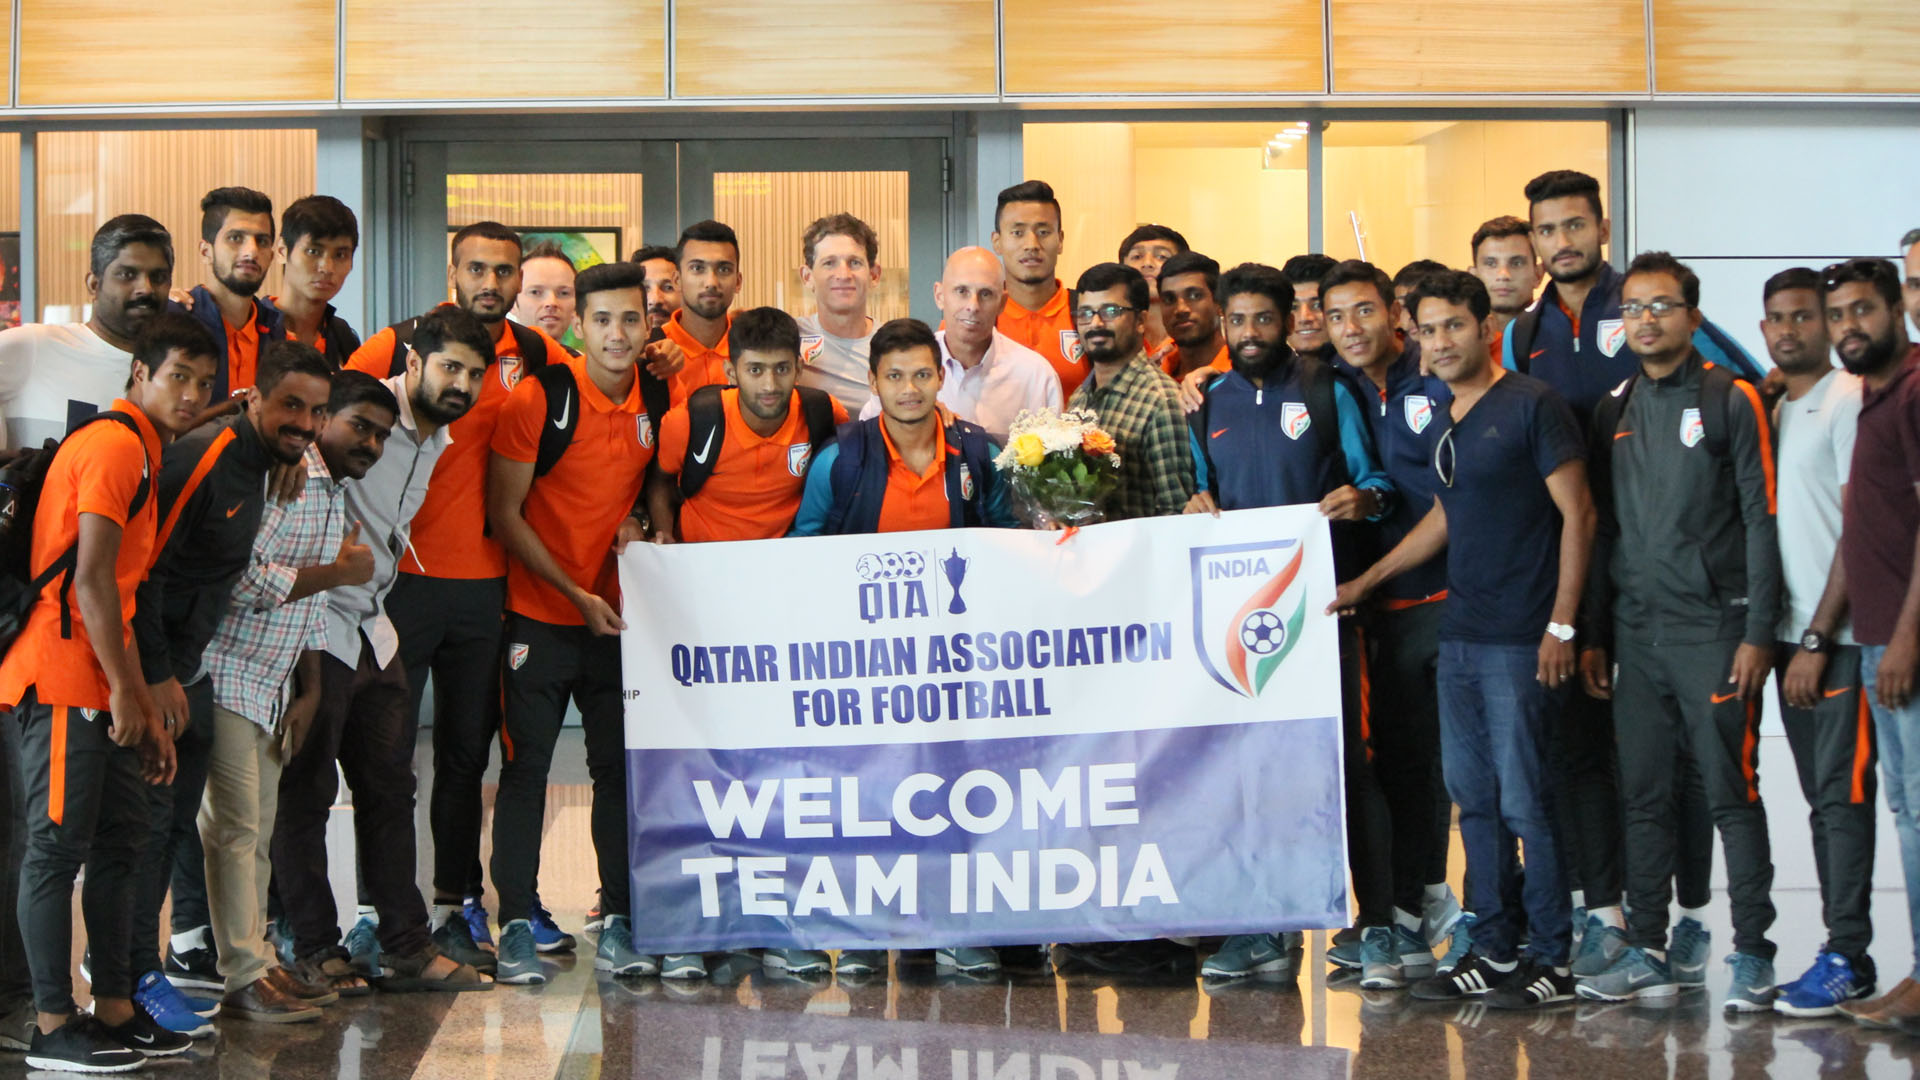 AFC U-23 Championship qualification: Qatar U23 1-0 India U23 - Colts